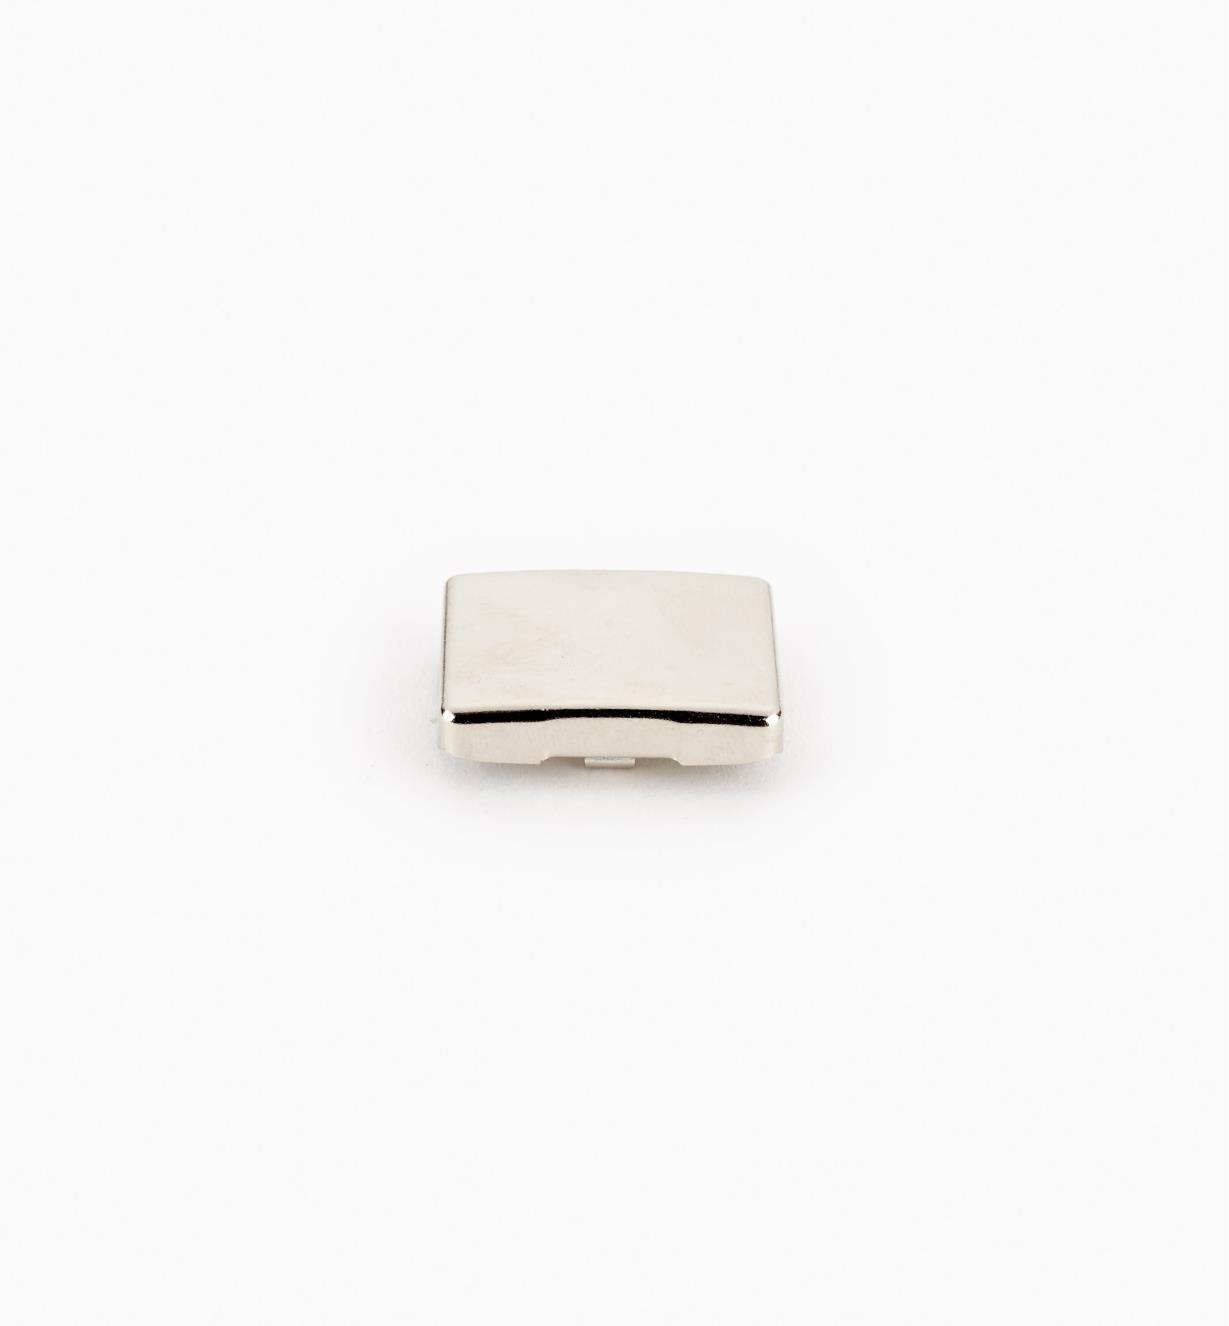 00B1556 - Compact Blumotion 105° Half-Overlay Hinge Cap, each